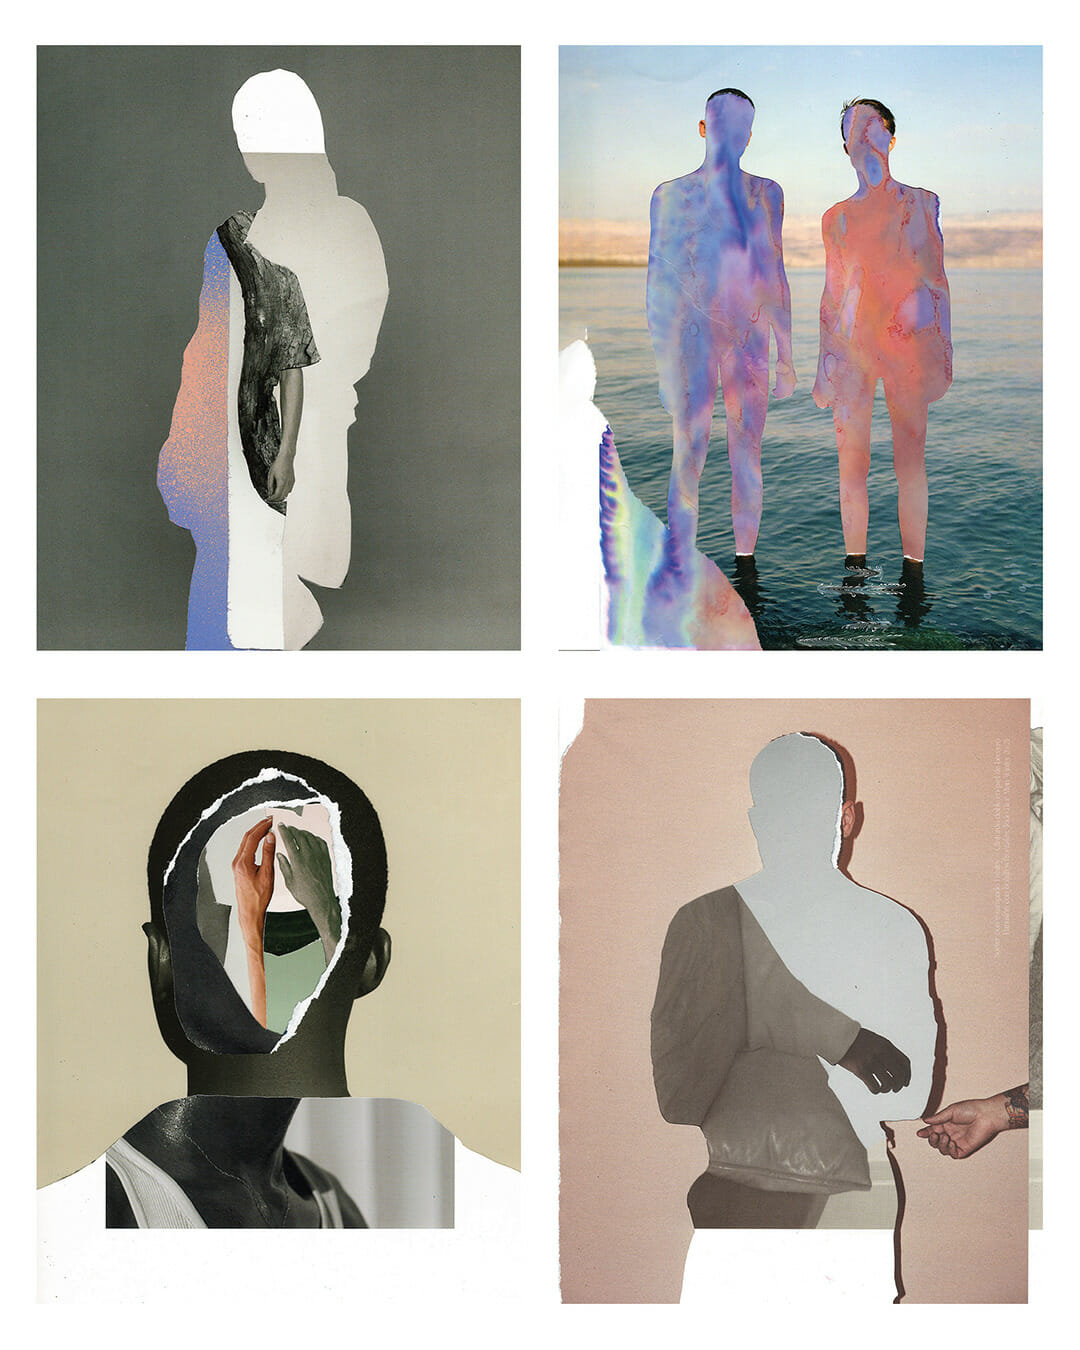 Collage masculinités Par Julen Iztueta